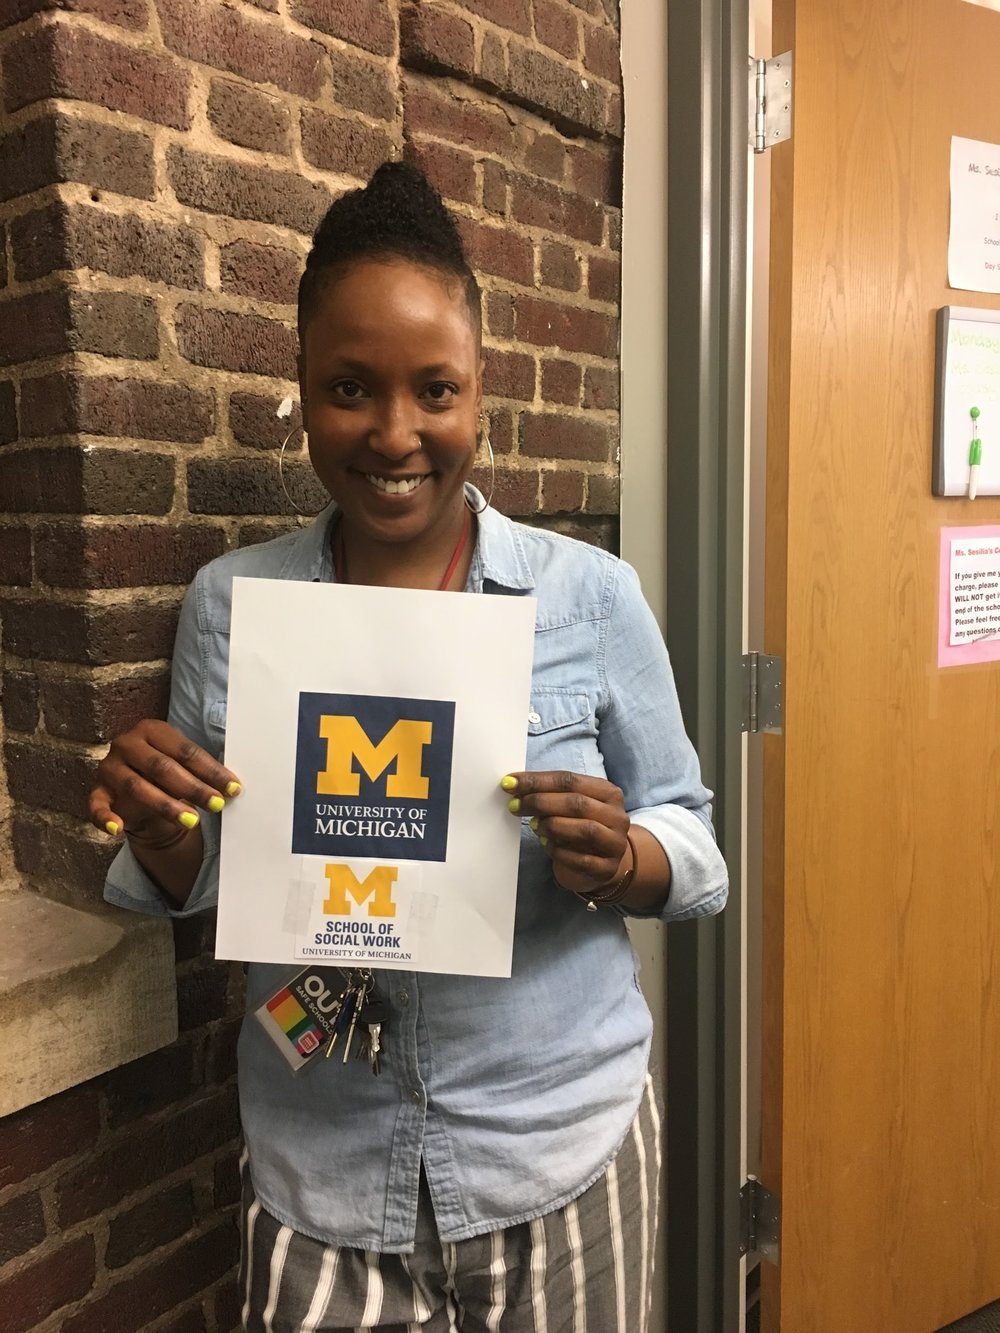 Proud University of Michigan Alum!